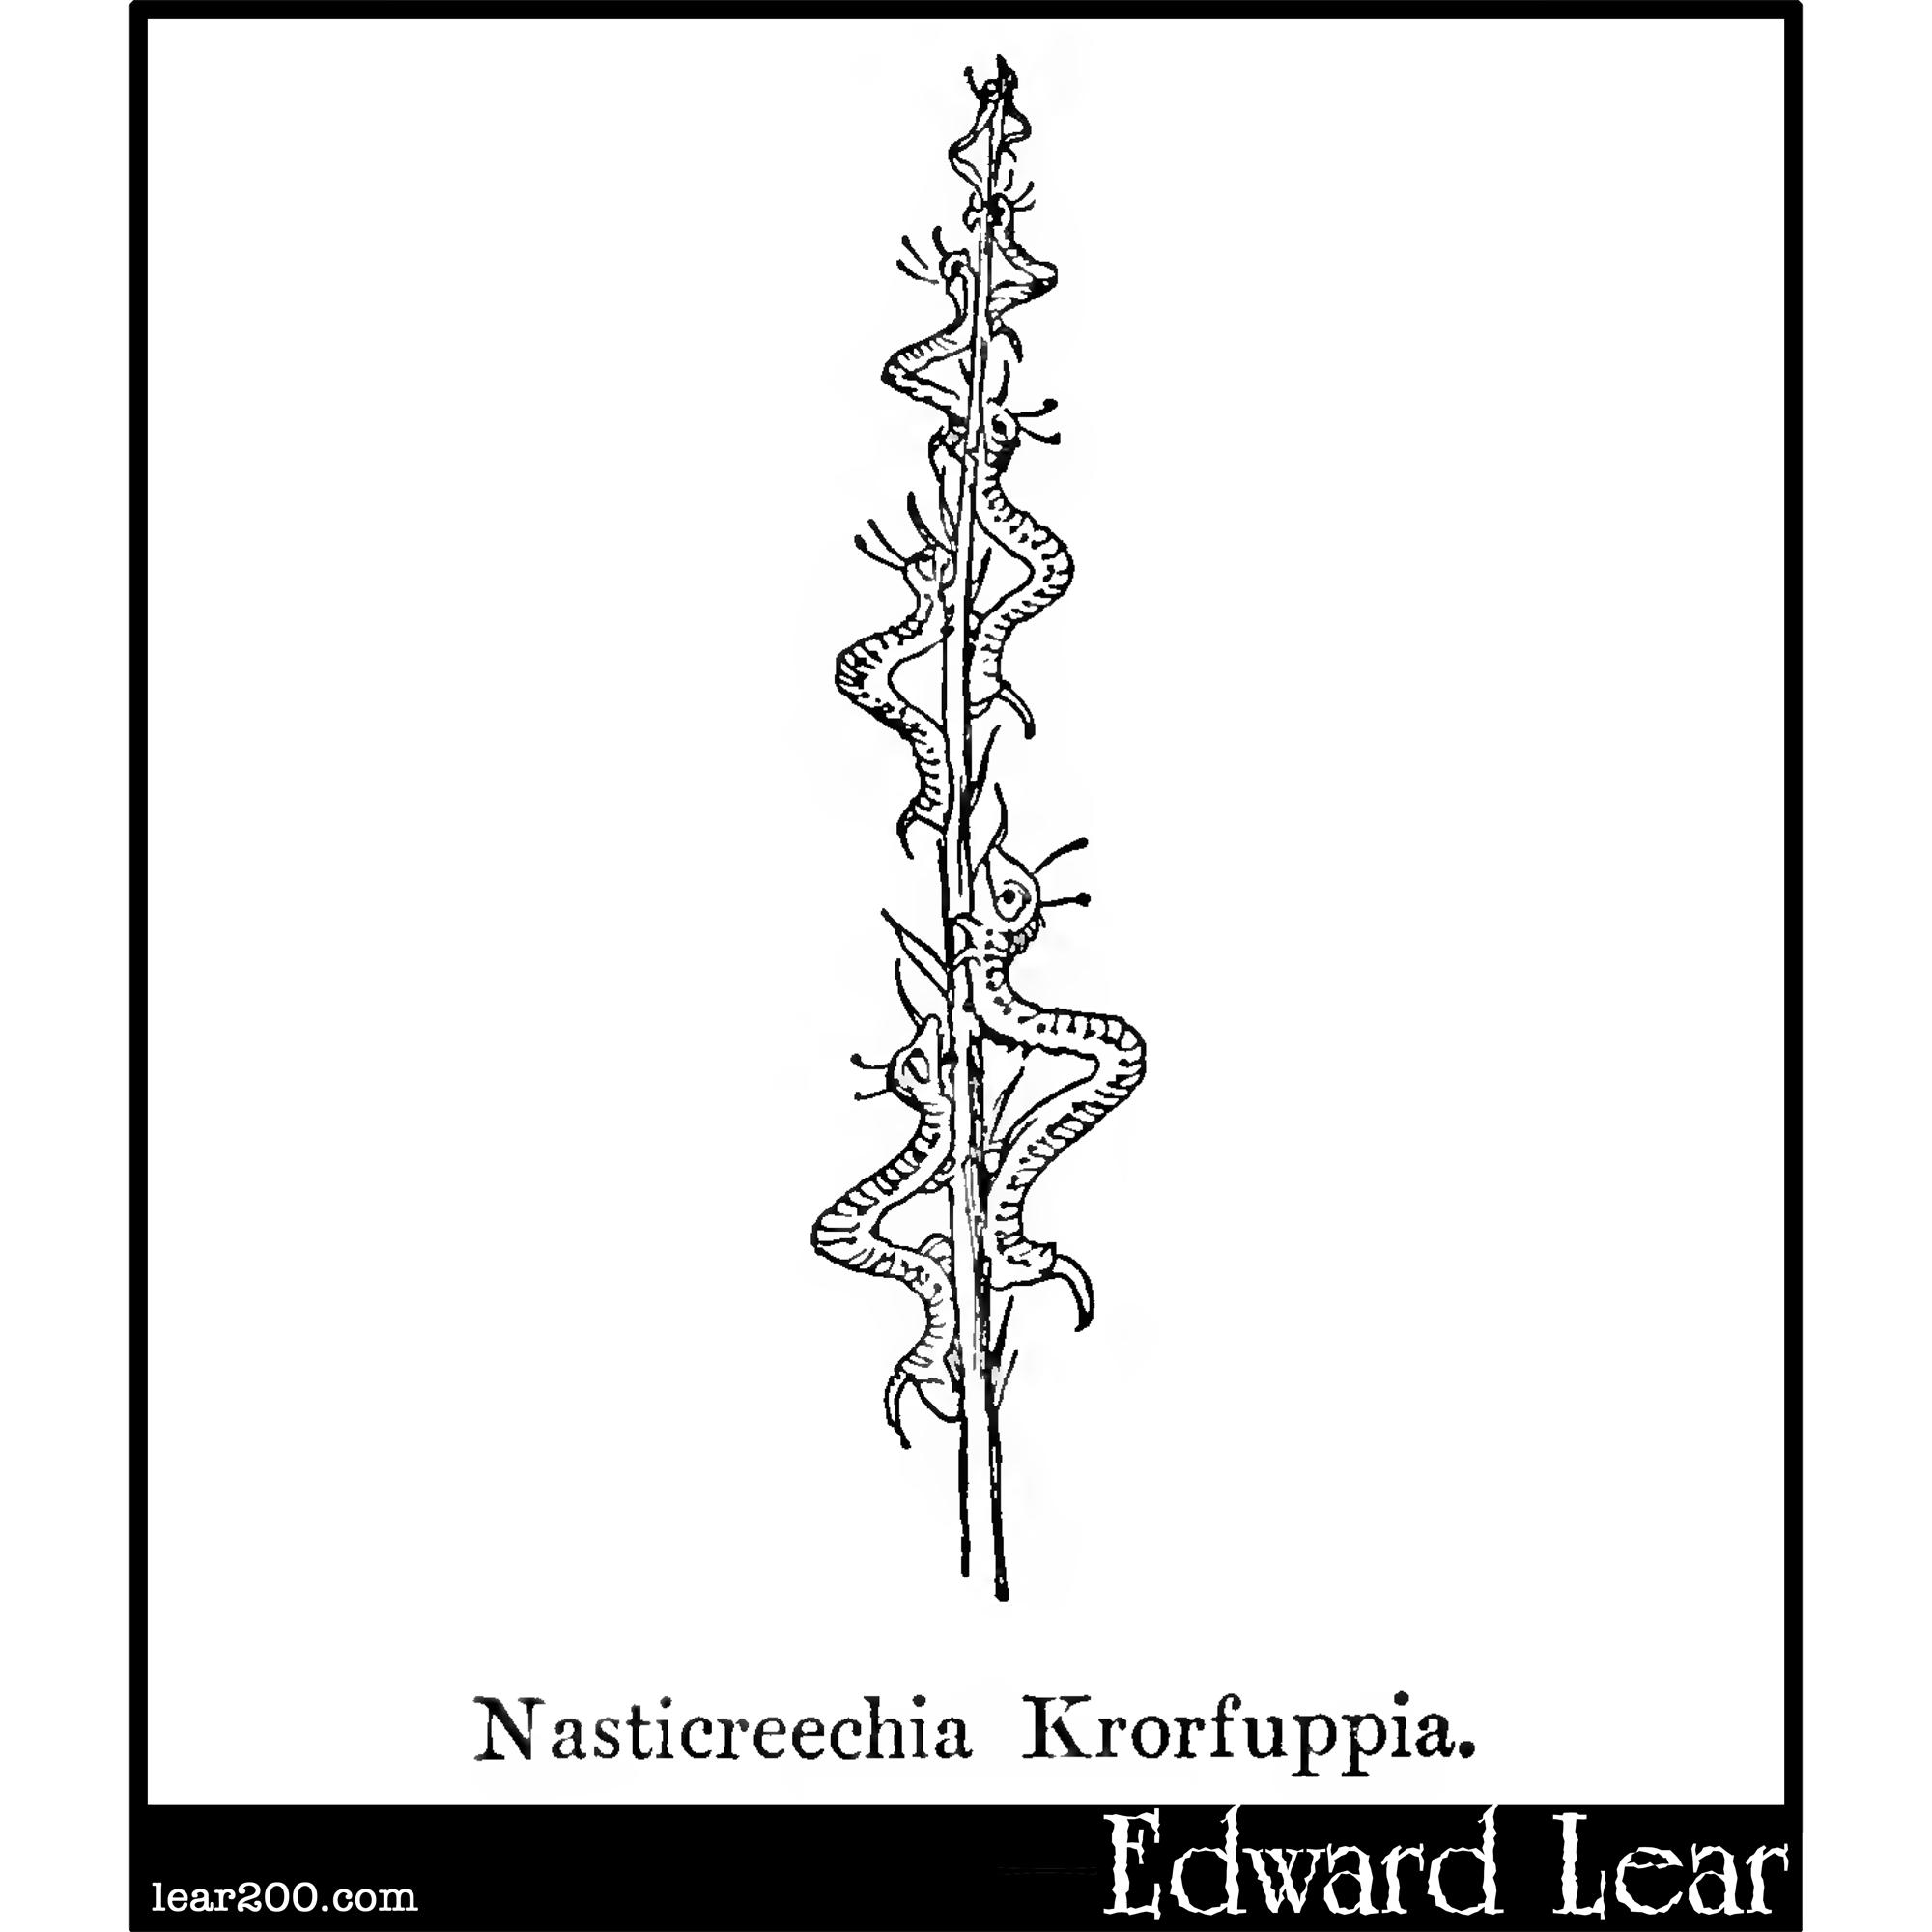 Nasticreechia Krorluppia